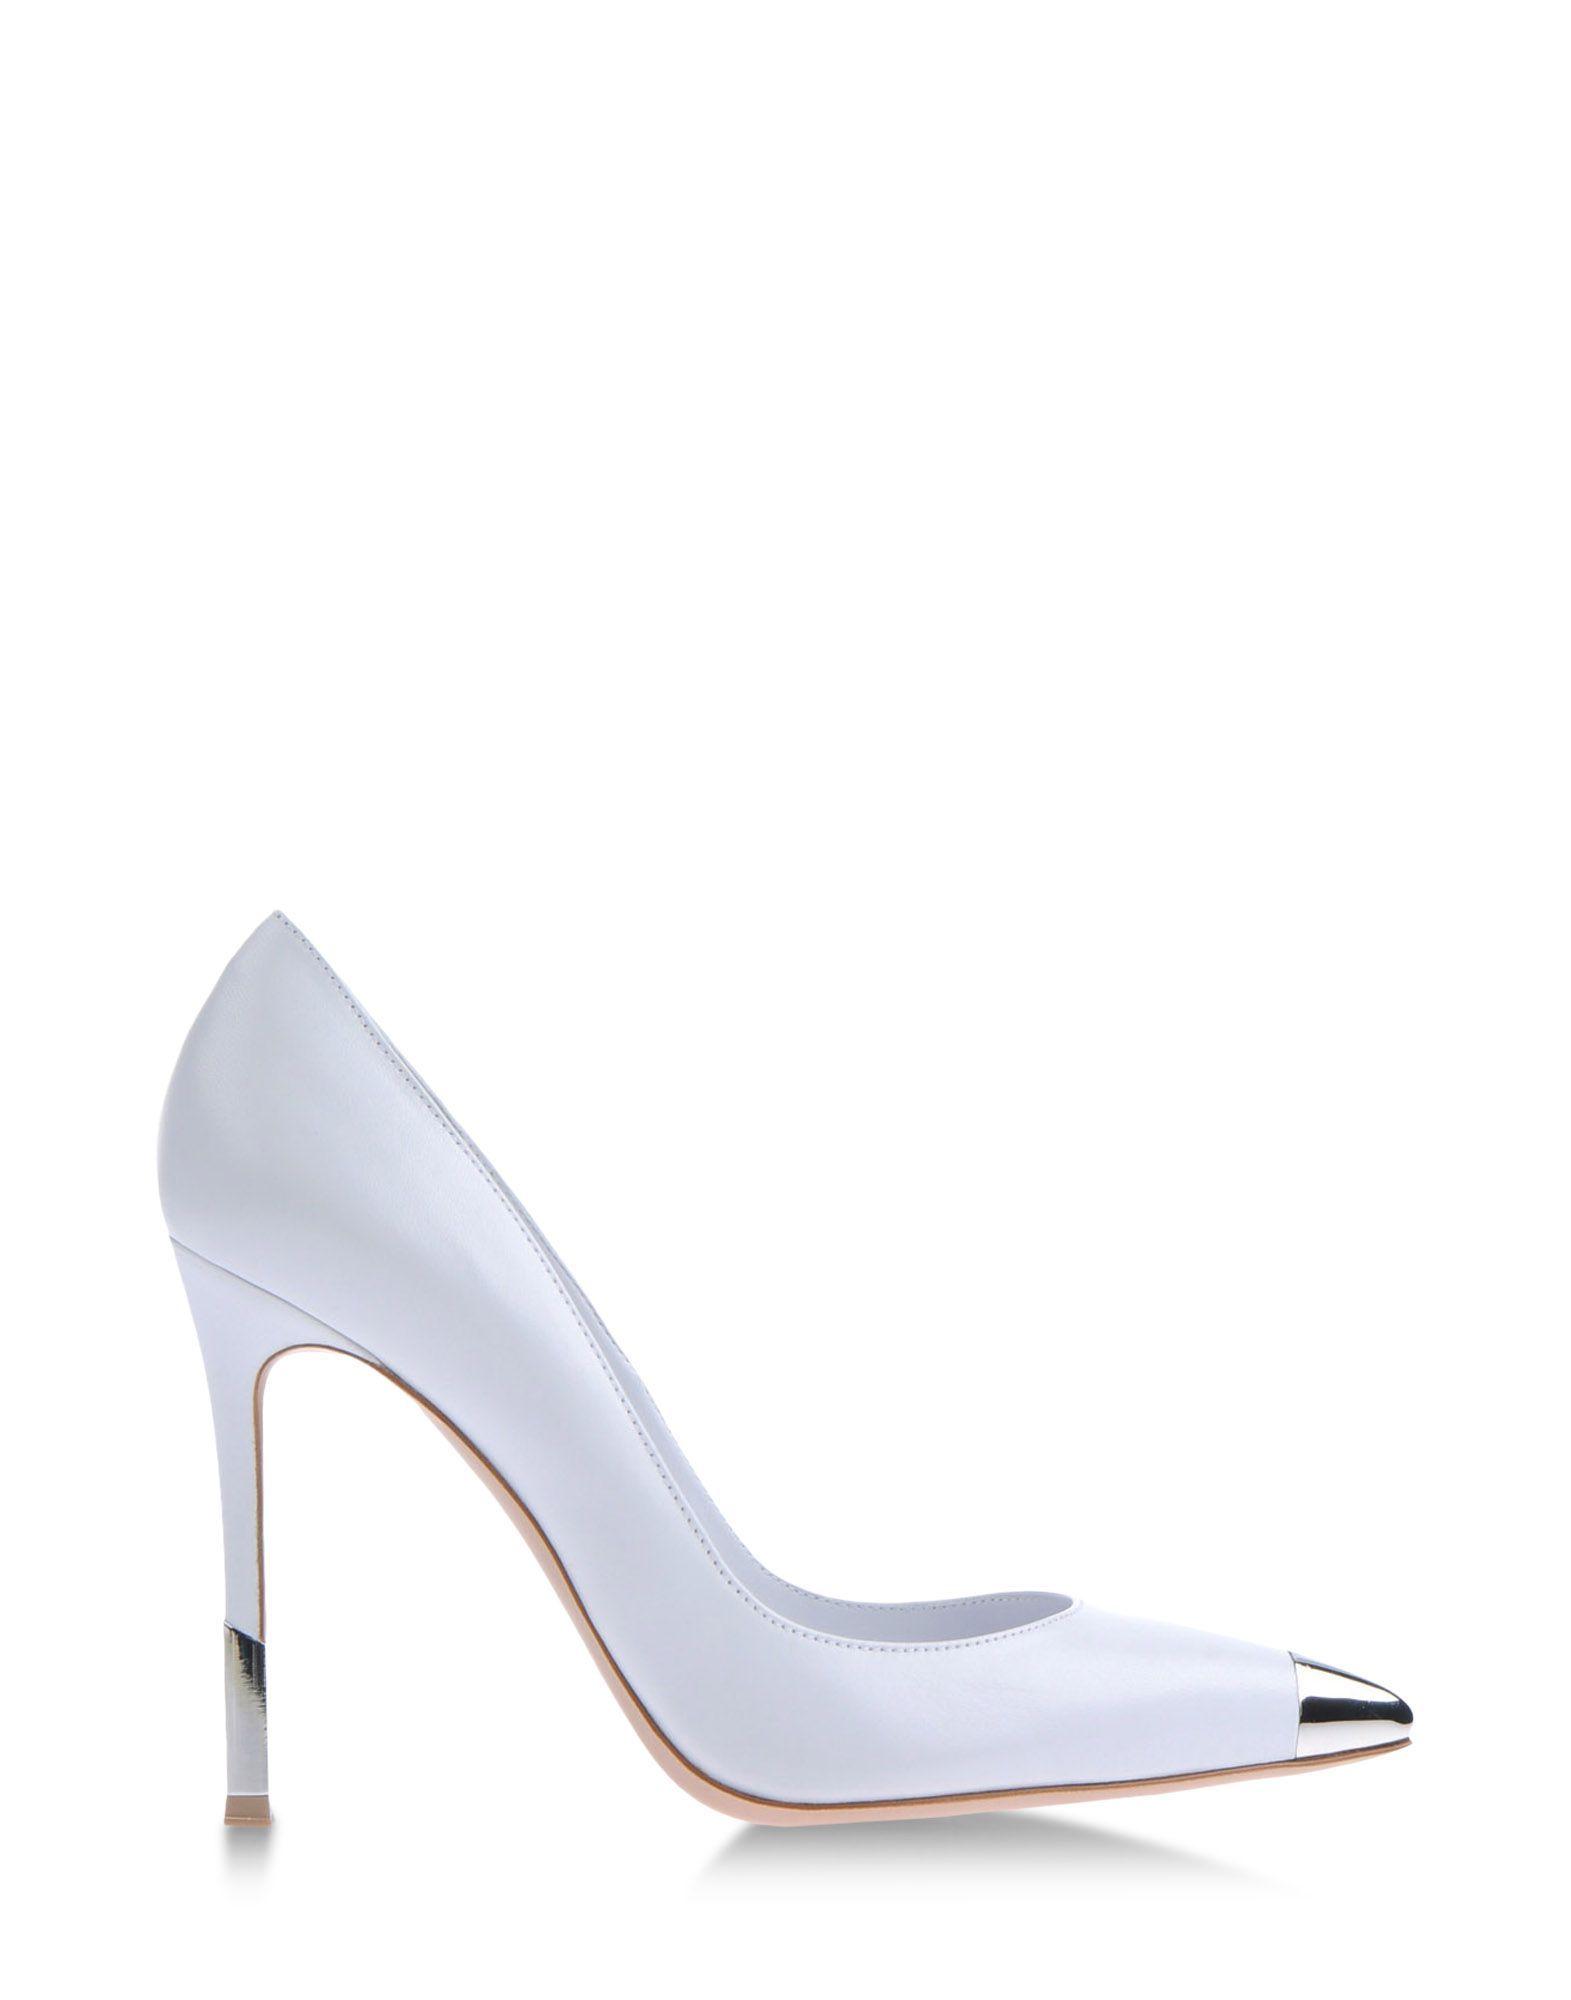 Metallic Shoes at  ShopBAZAAR - Gianvito Rossi White and Silver Cap-Toe  Pumps